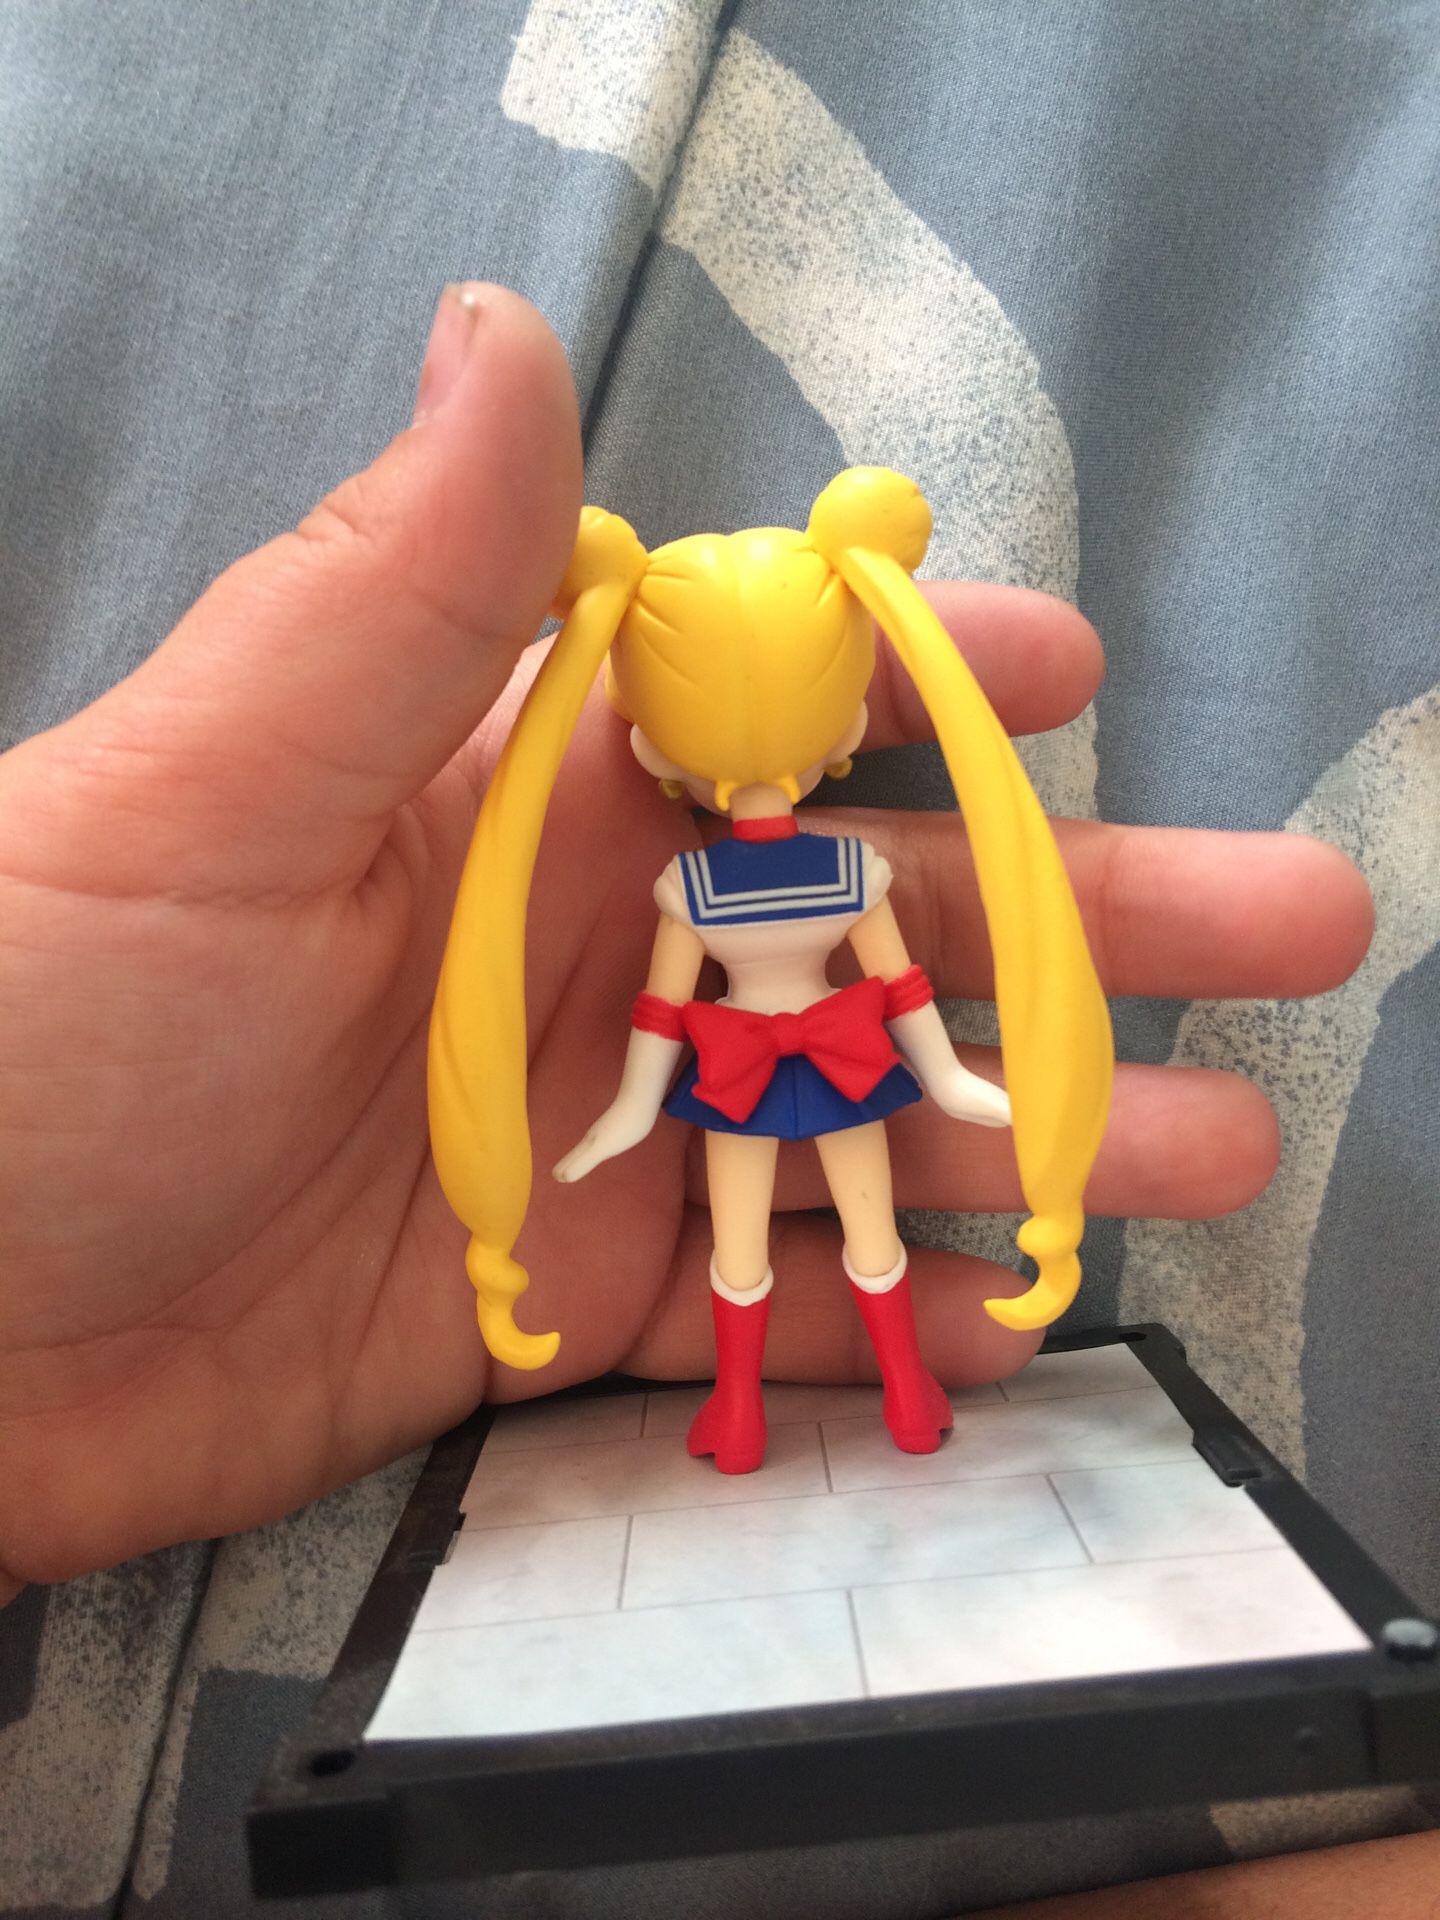 Sailor moon anime figure